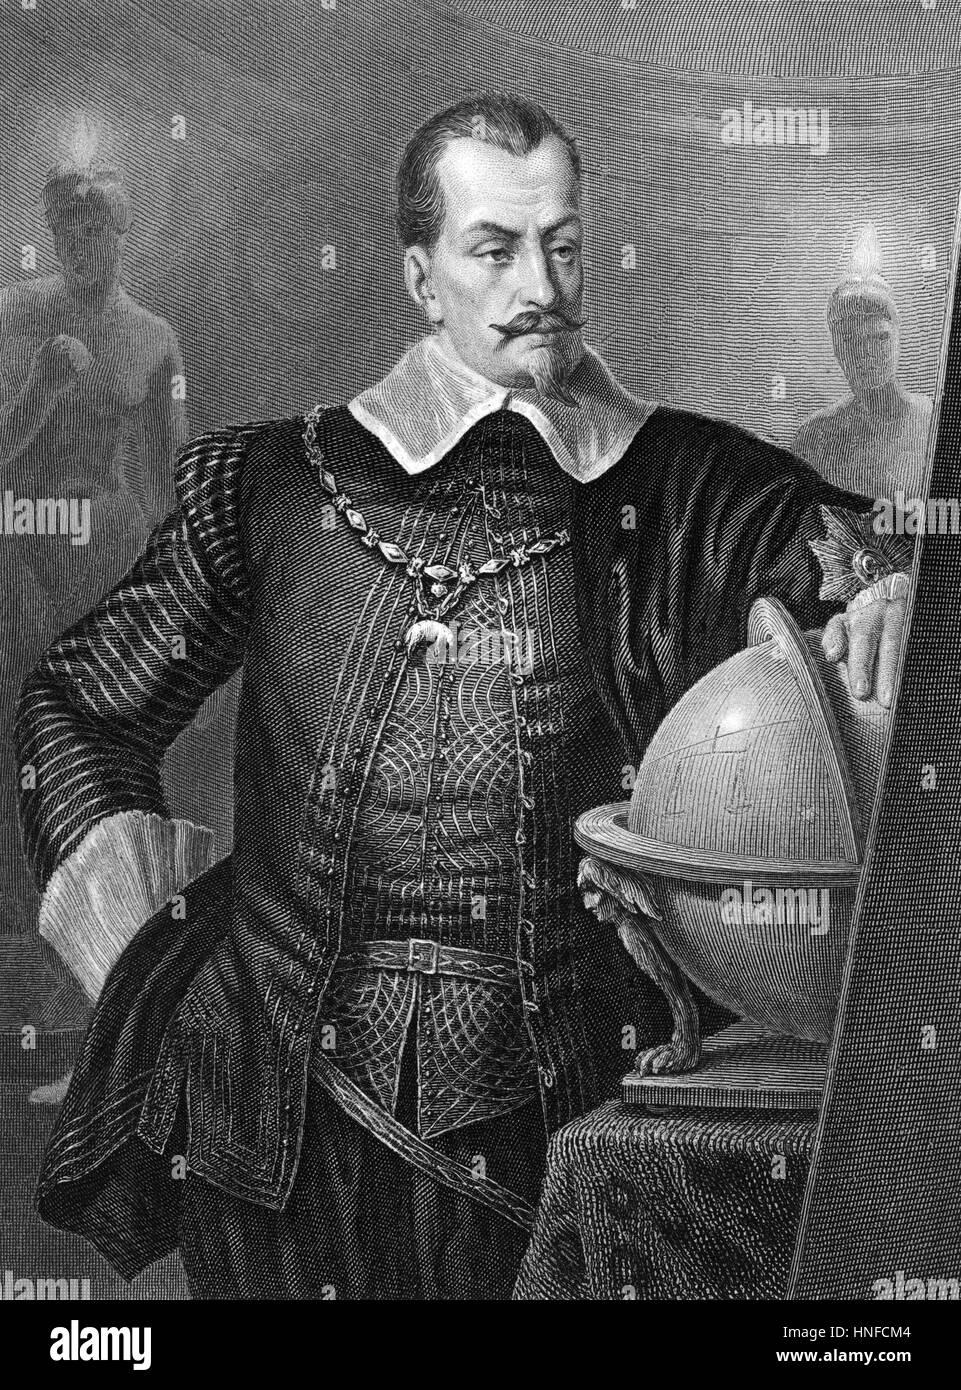 ALBRECHT von WALLENSTEIN (1583-1634) Bohemian army commander and politician - Stock Image